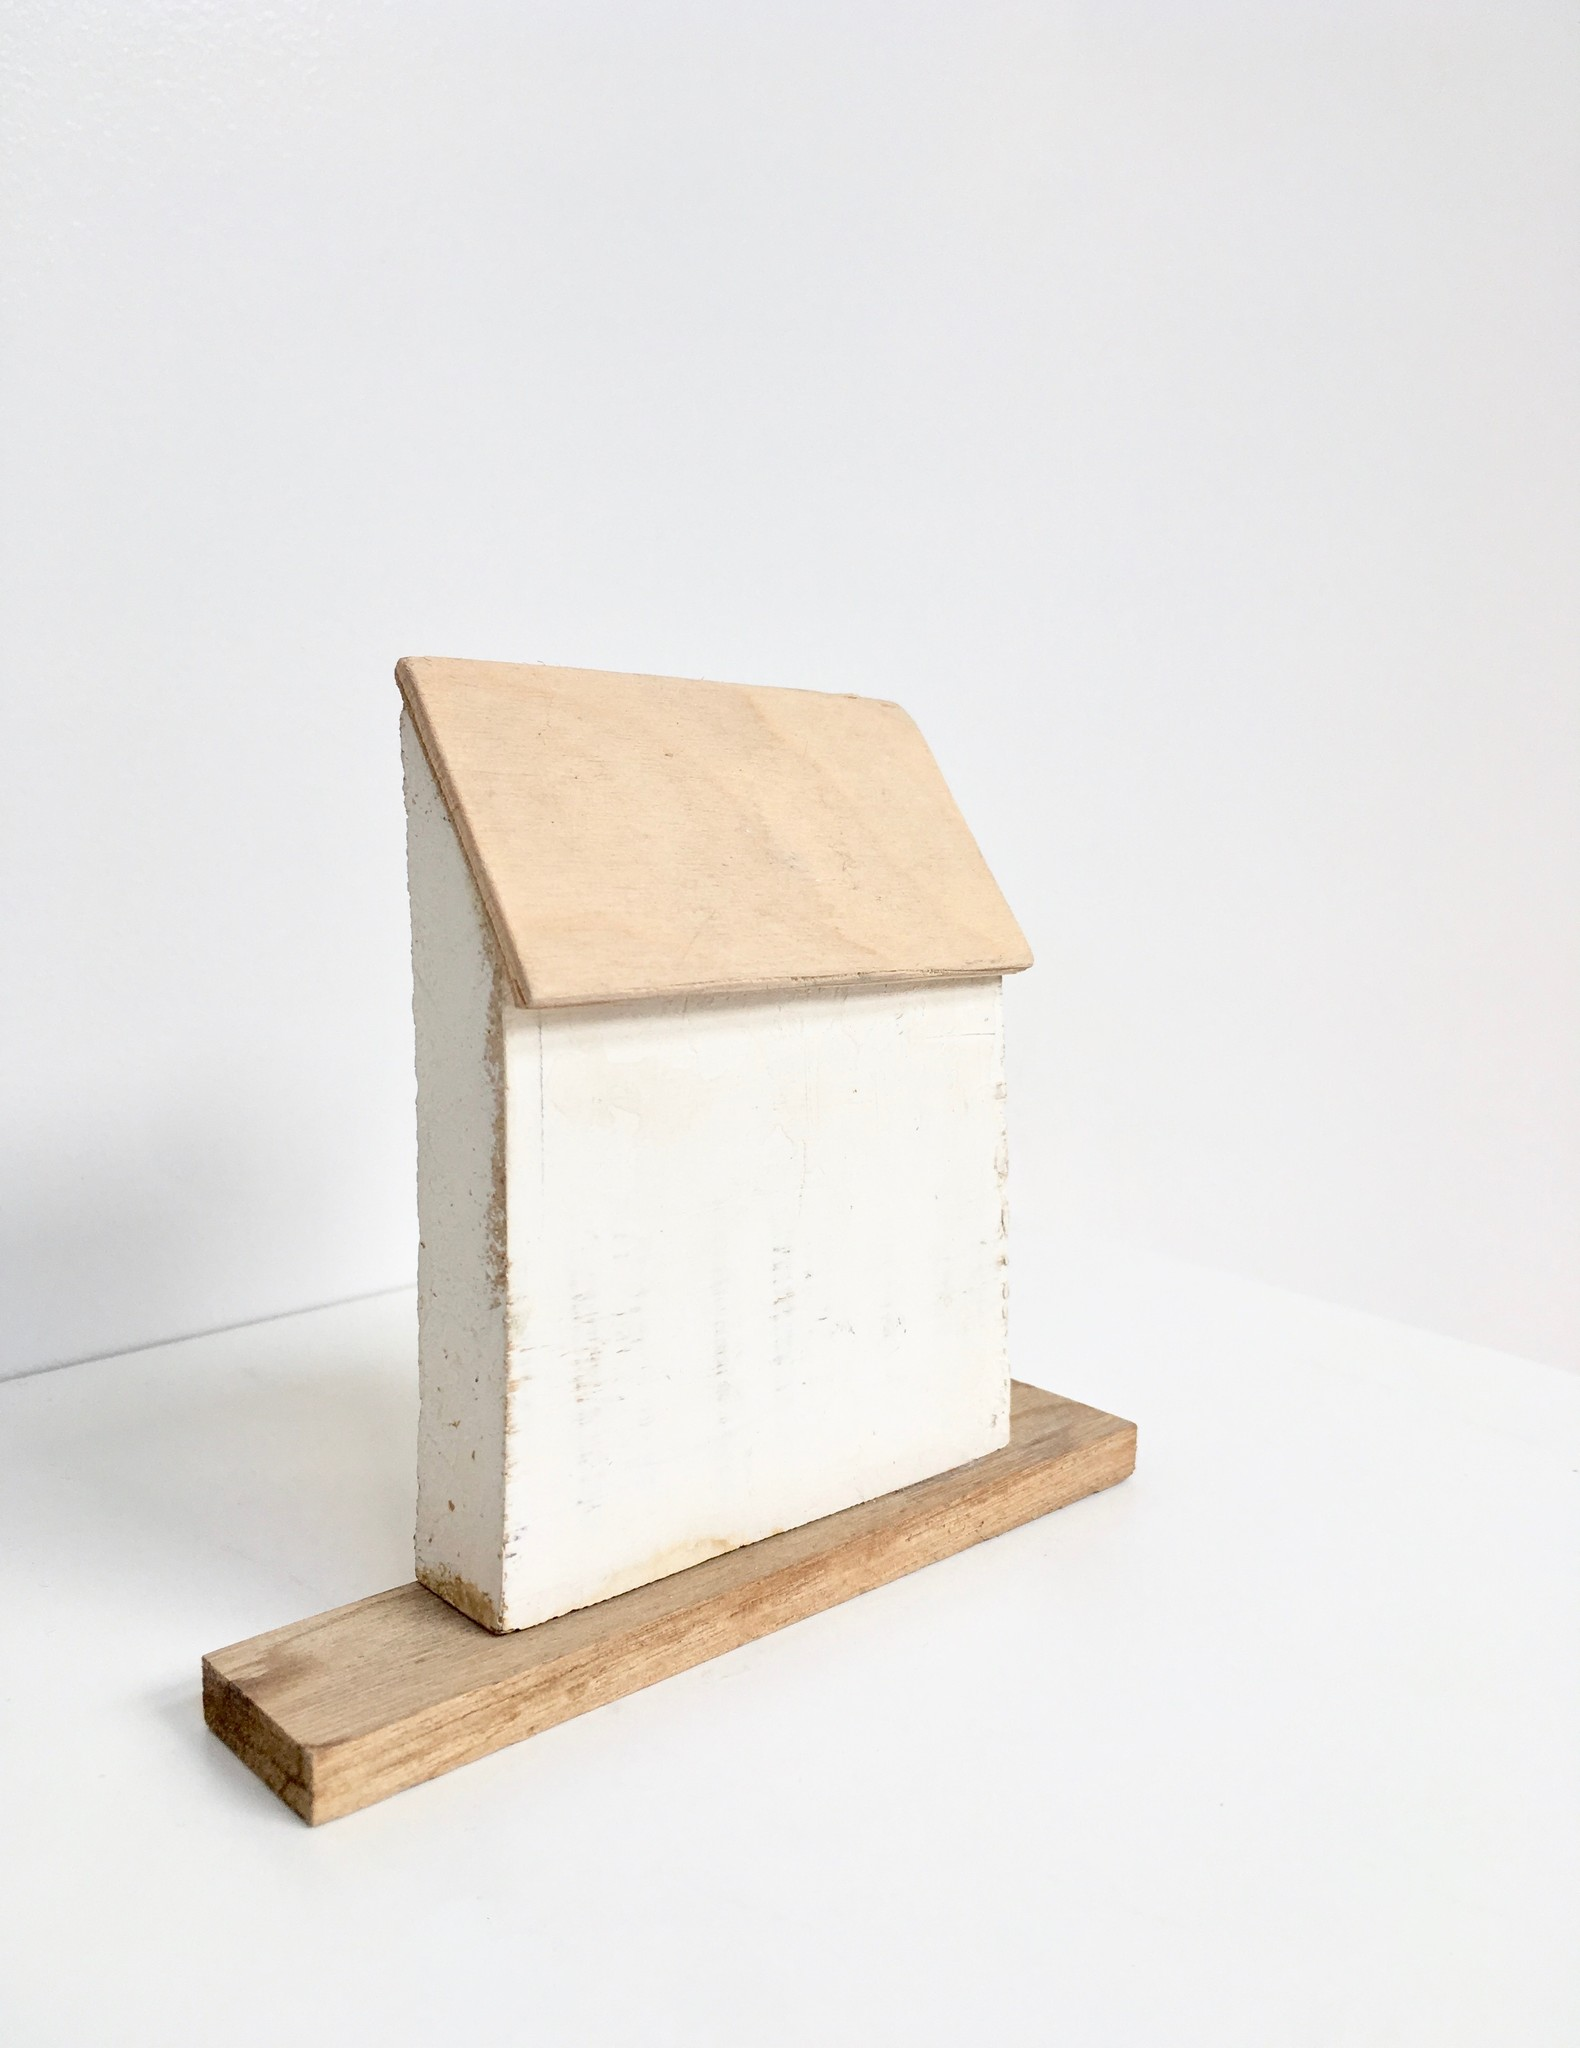 JELLEMA | House, 2013